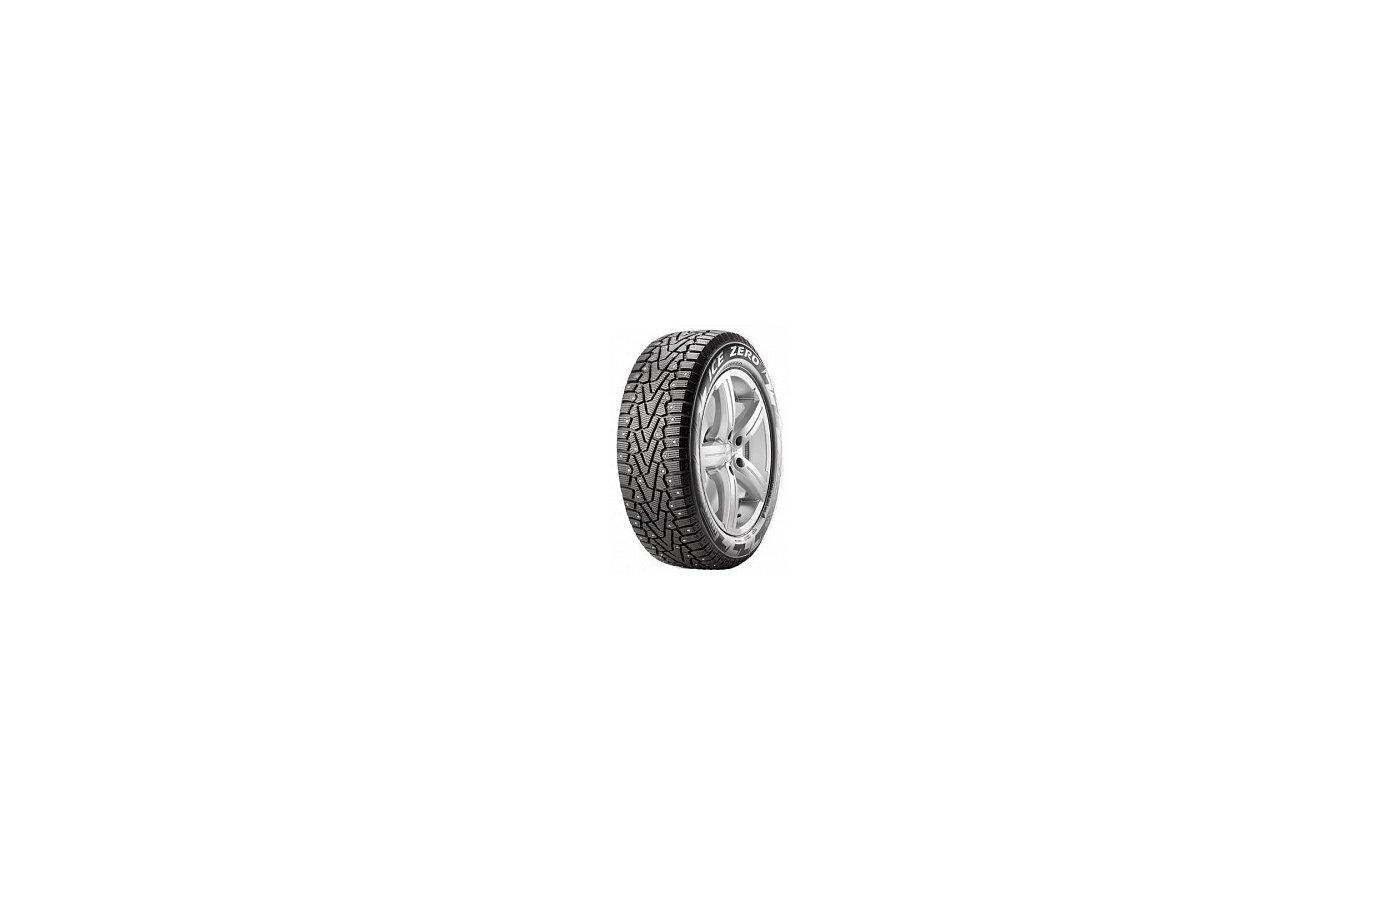 Шина Pirelli Ice Zero 255/45 R18 TL 103H XL шип